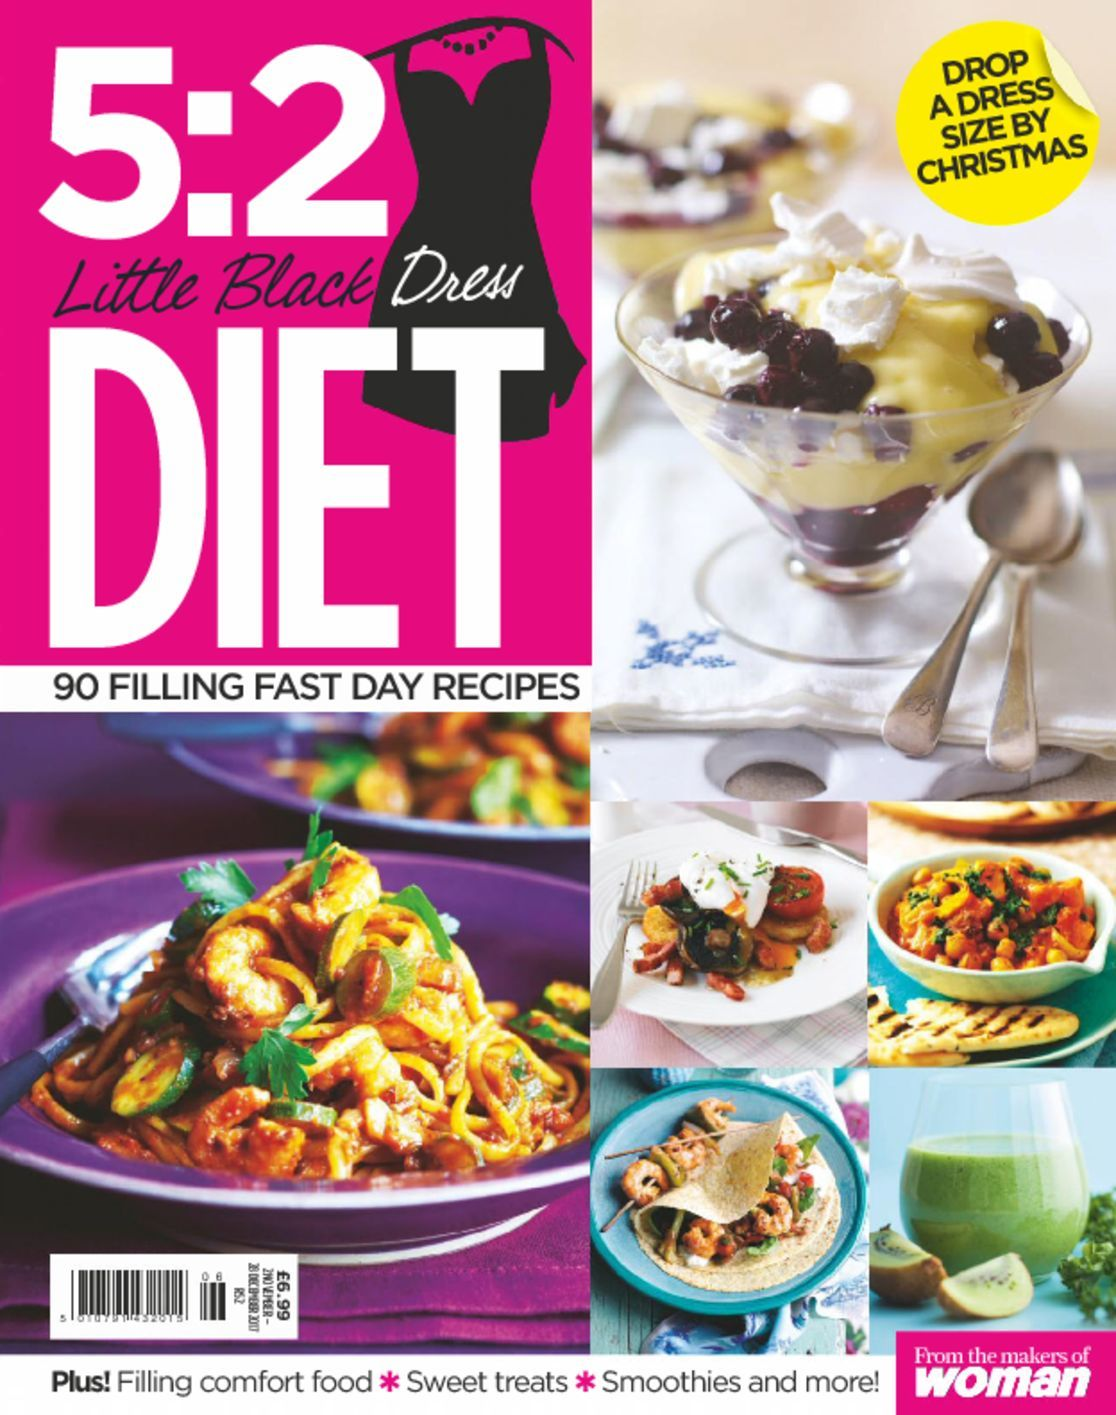 500 Calorie Digital